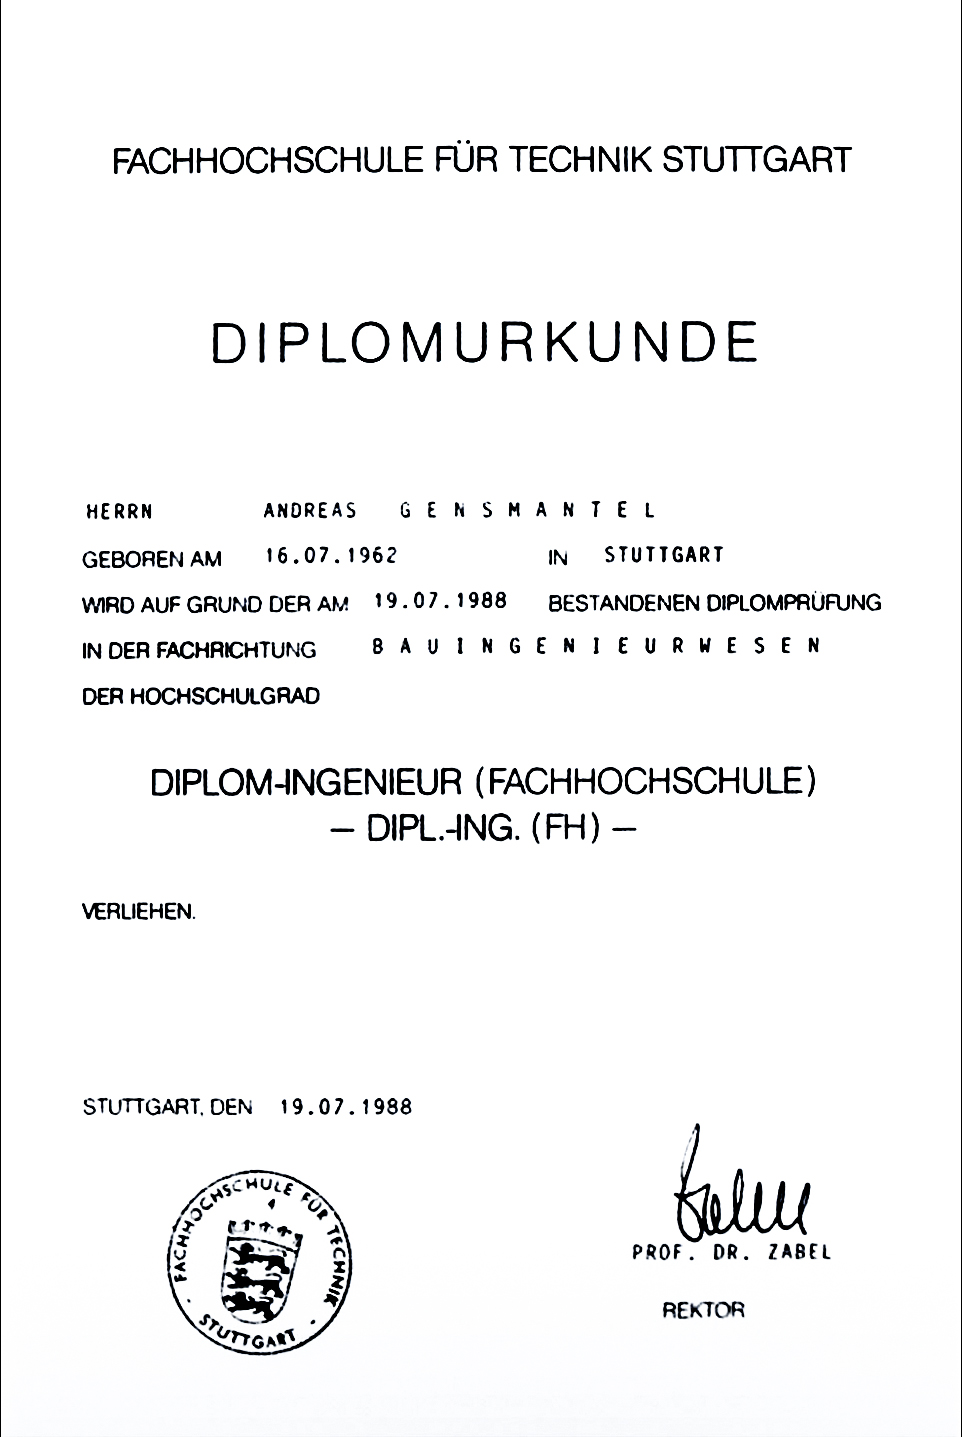 Diplomurkunde: Andreas Gensmantel